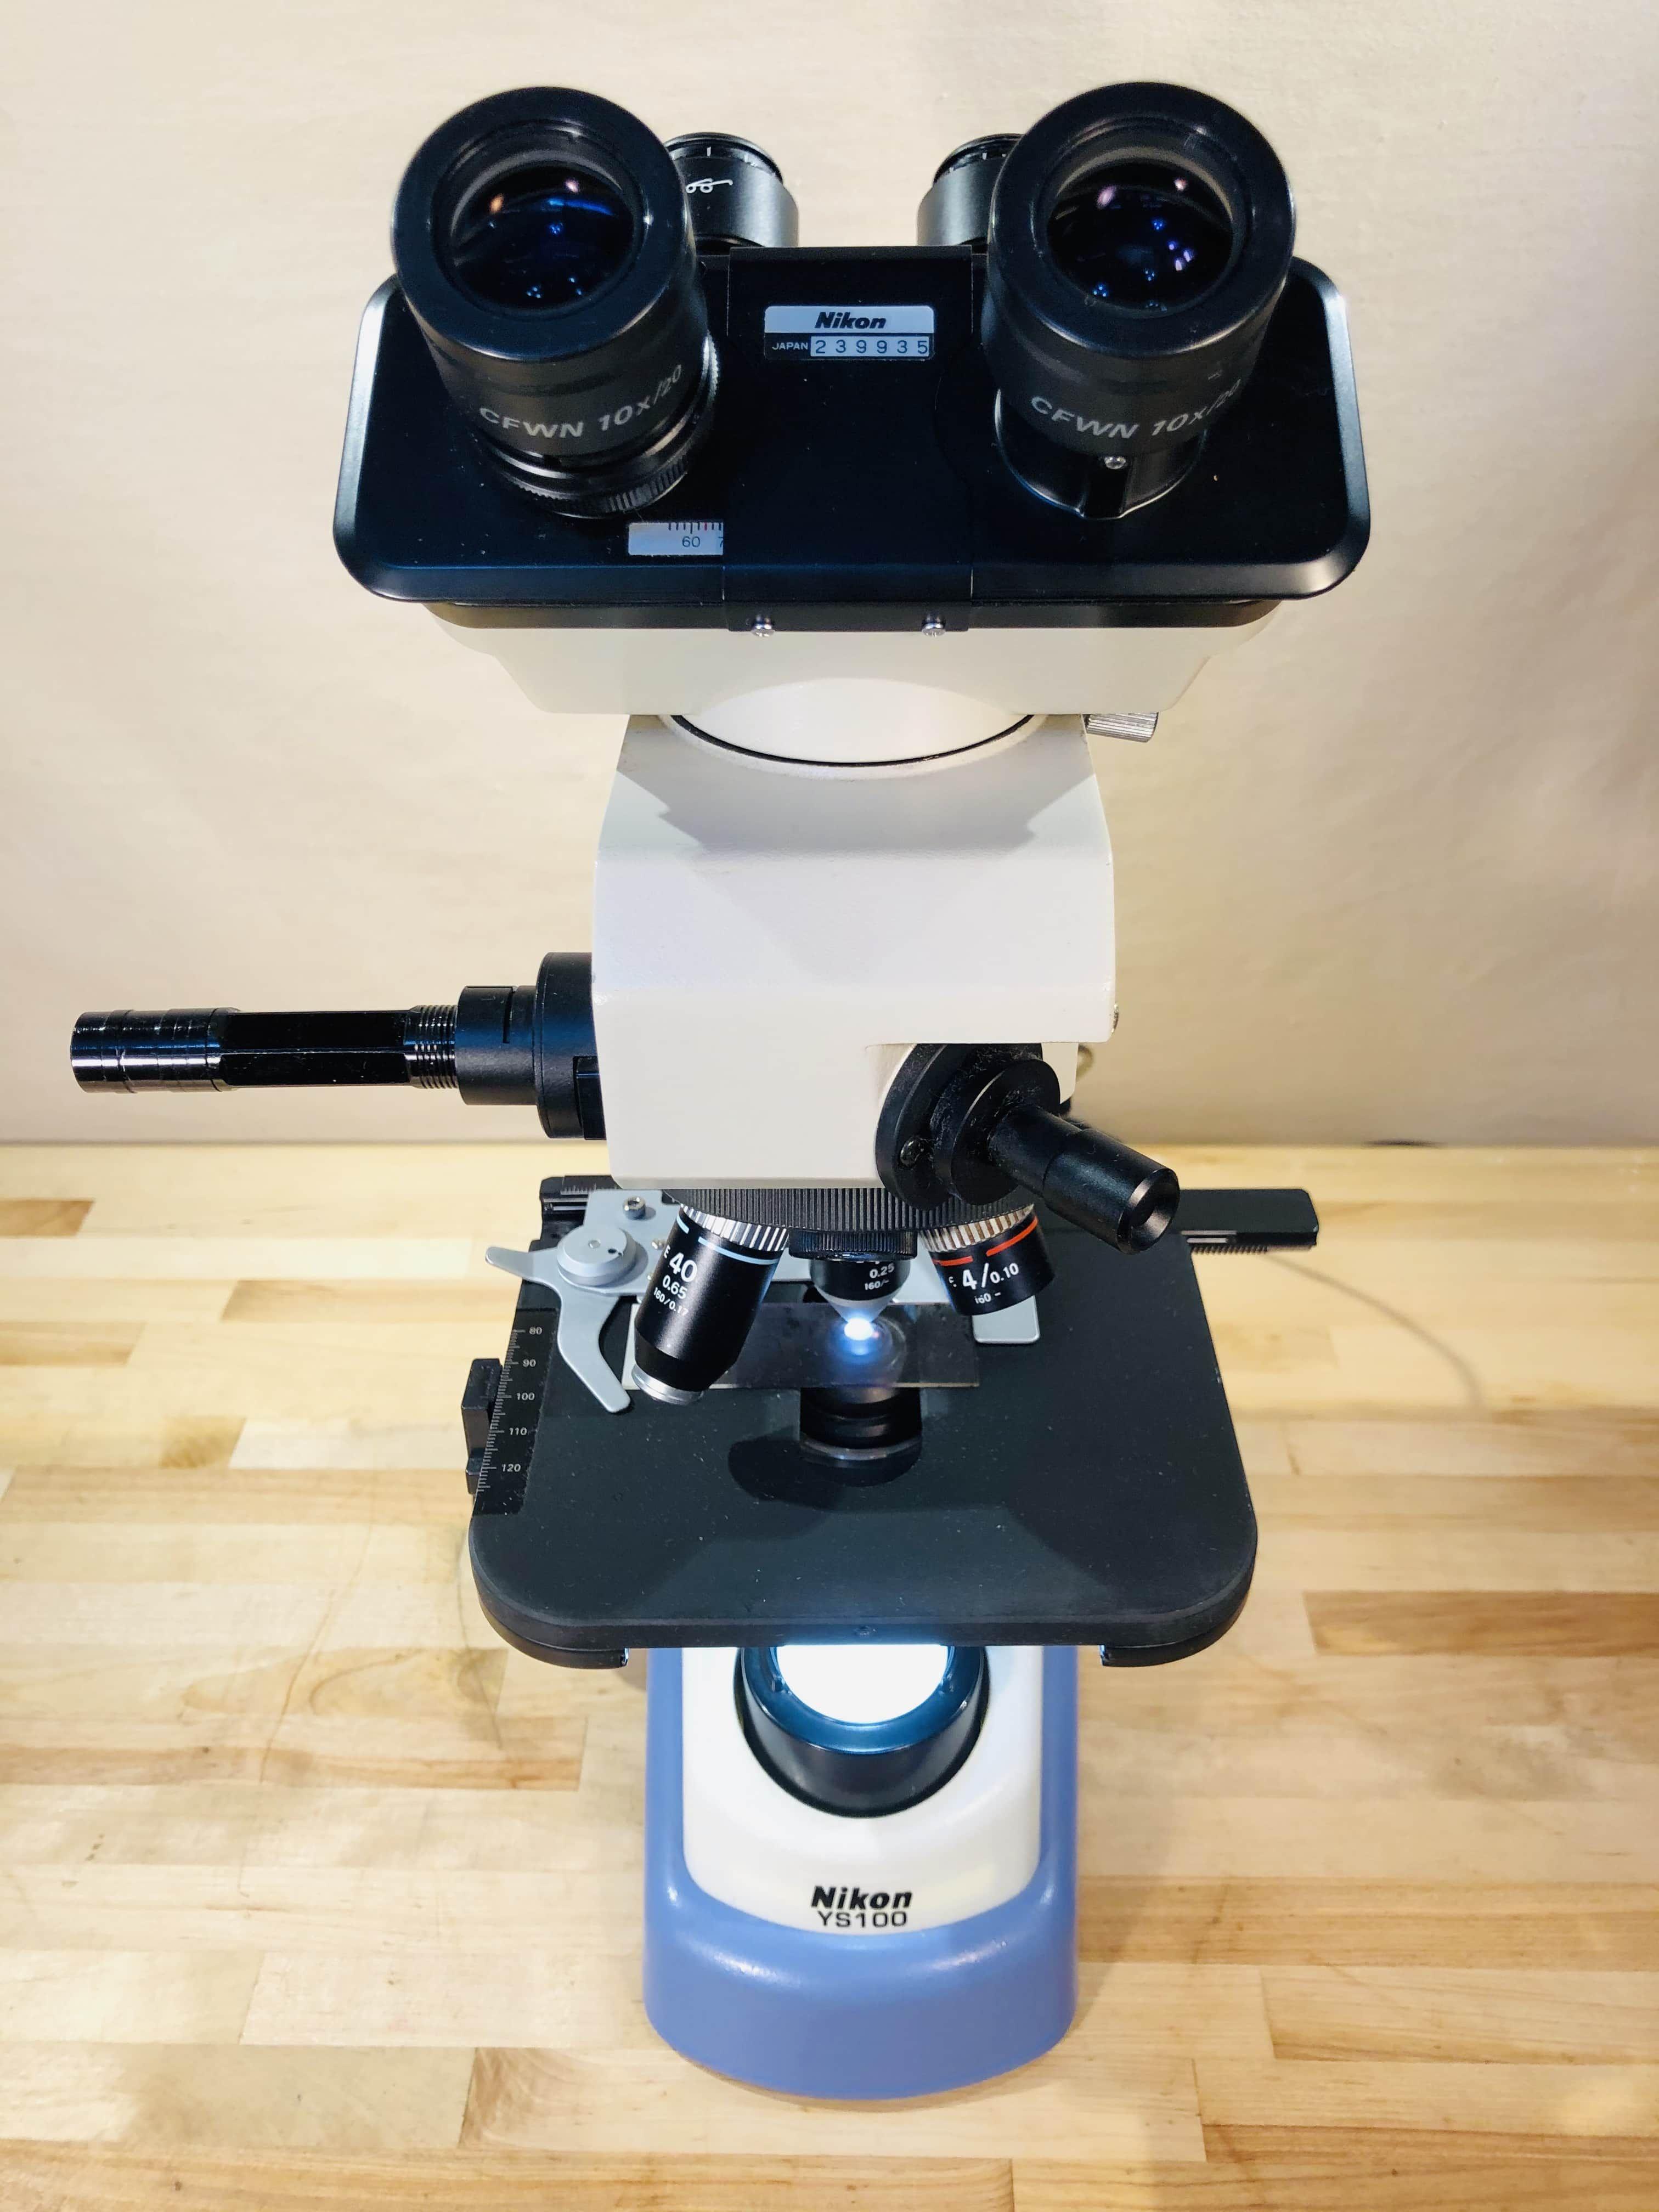 Nikon YS2 Microscope with Teaching Attachment